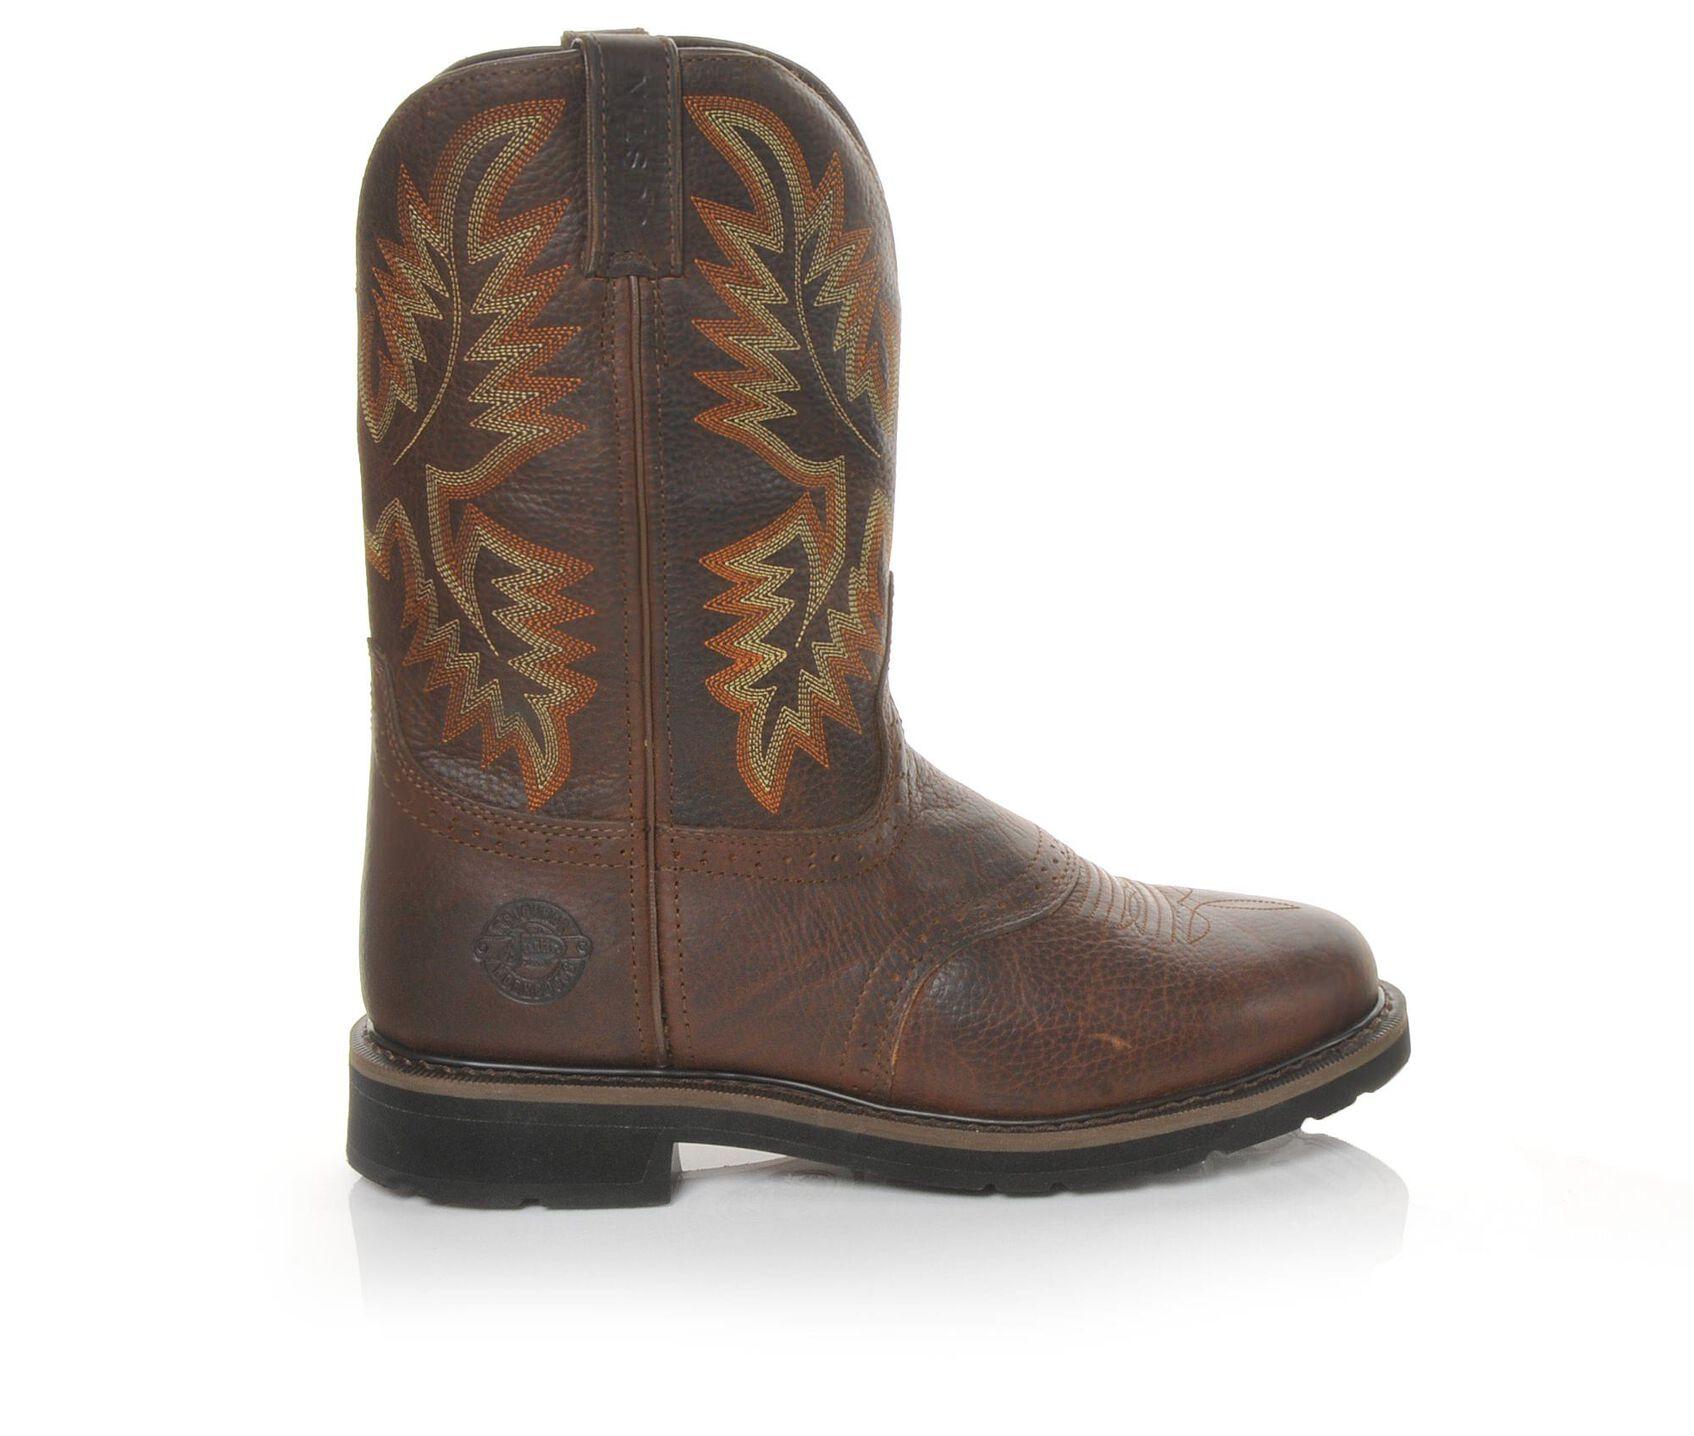 e739b38c371 Justin Cowboy Boots Justin Gold Toe Cowboy Boots Women Size 7